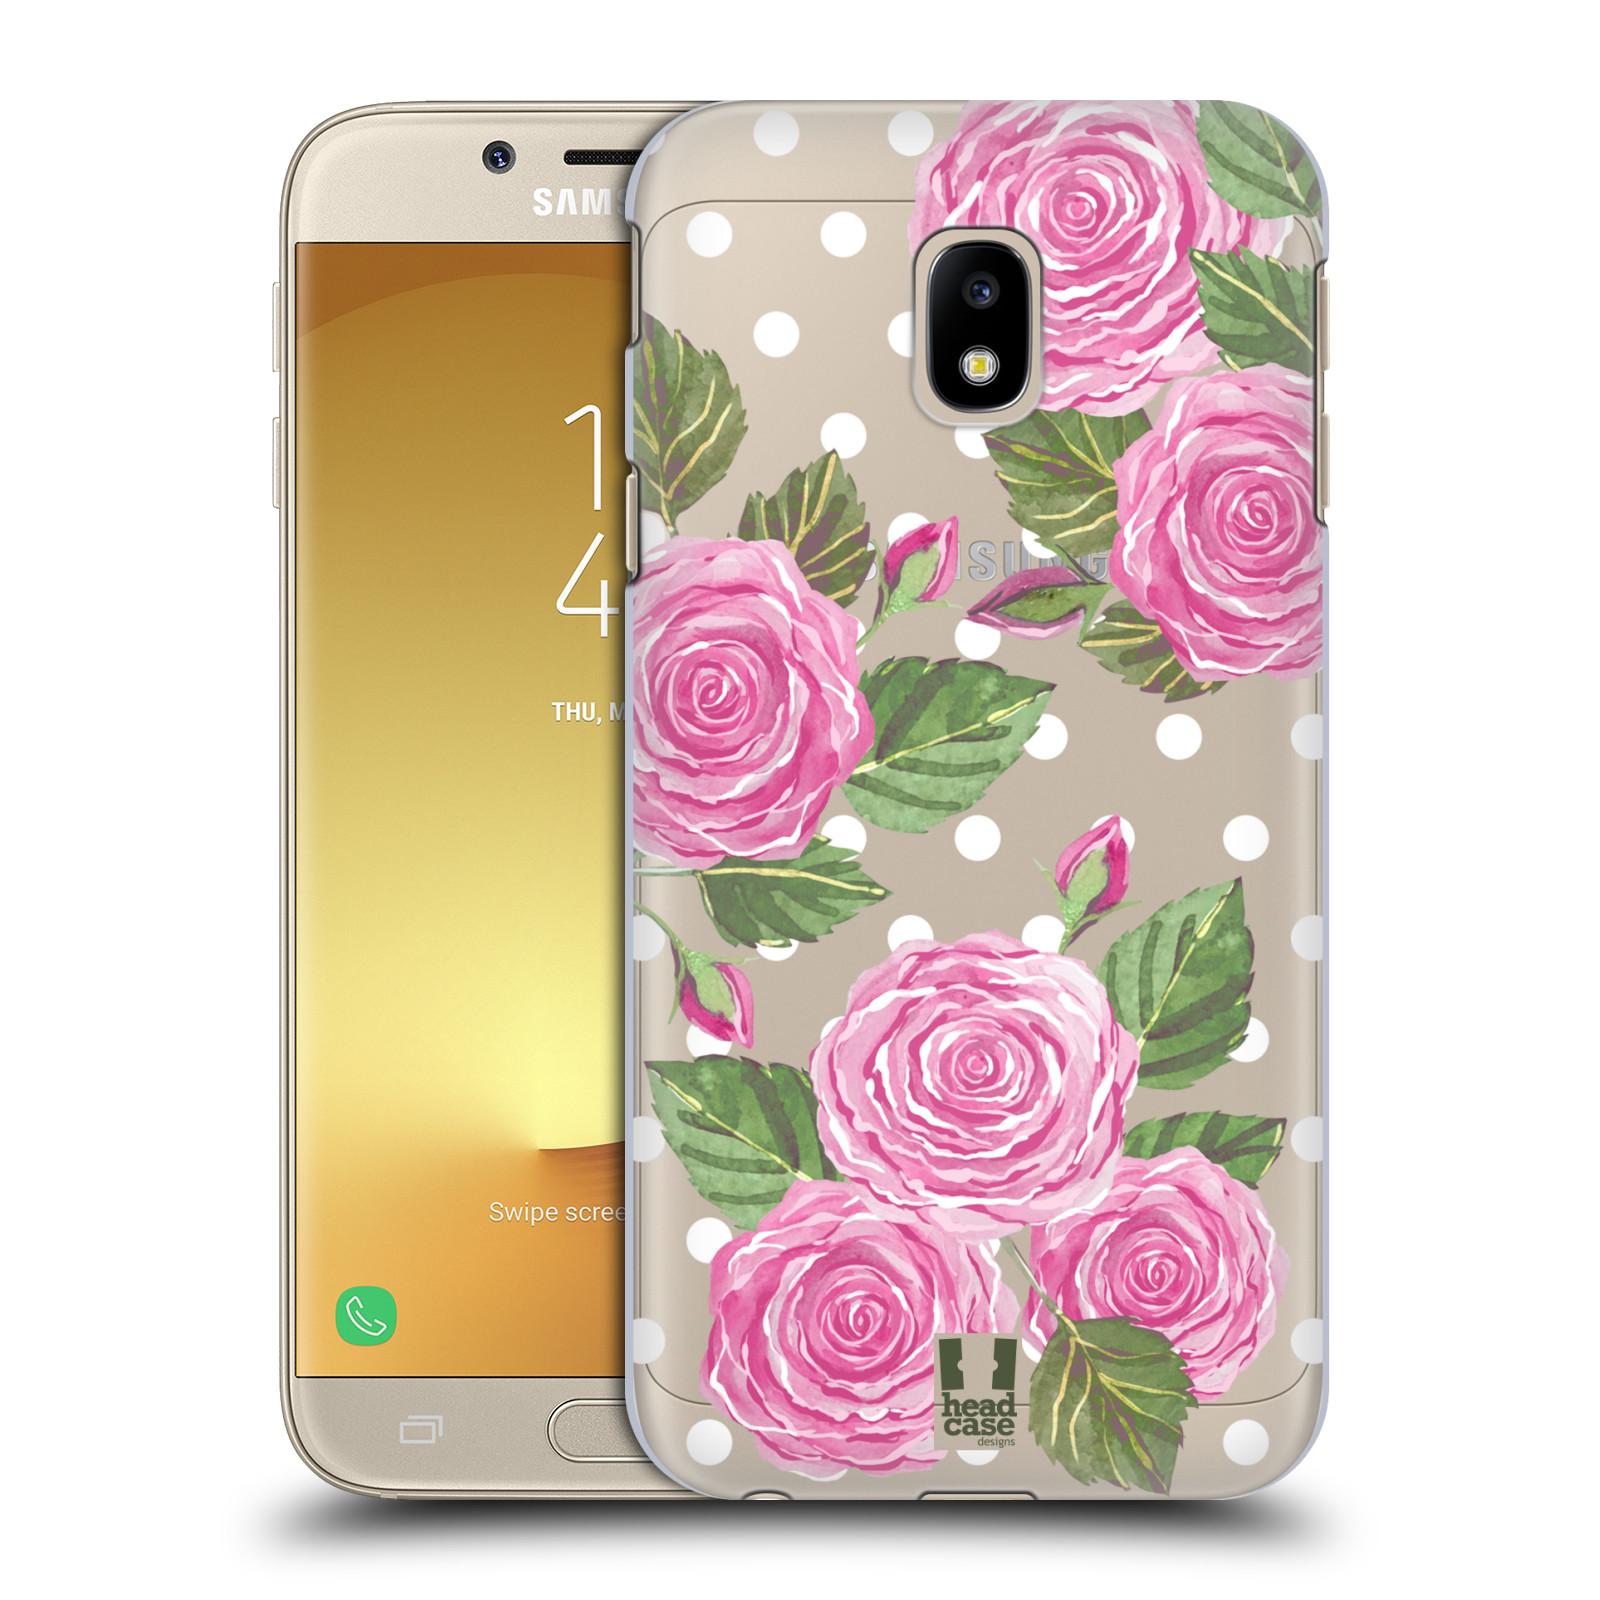 Plastové pouzdro na mobil Samsung Galaxy J3 (2017) - Head Case - Hezoučké růžičky - průhledné